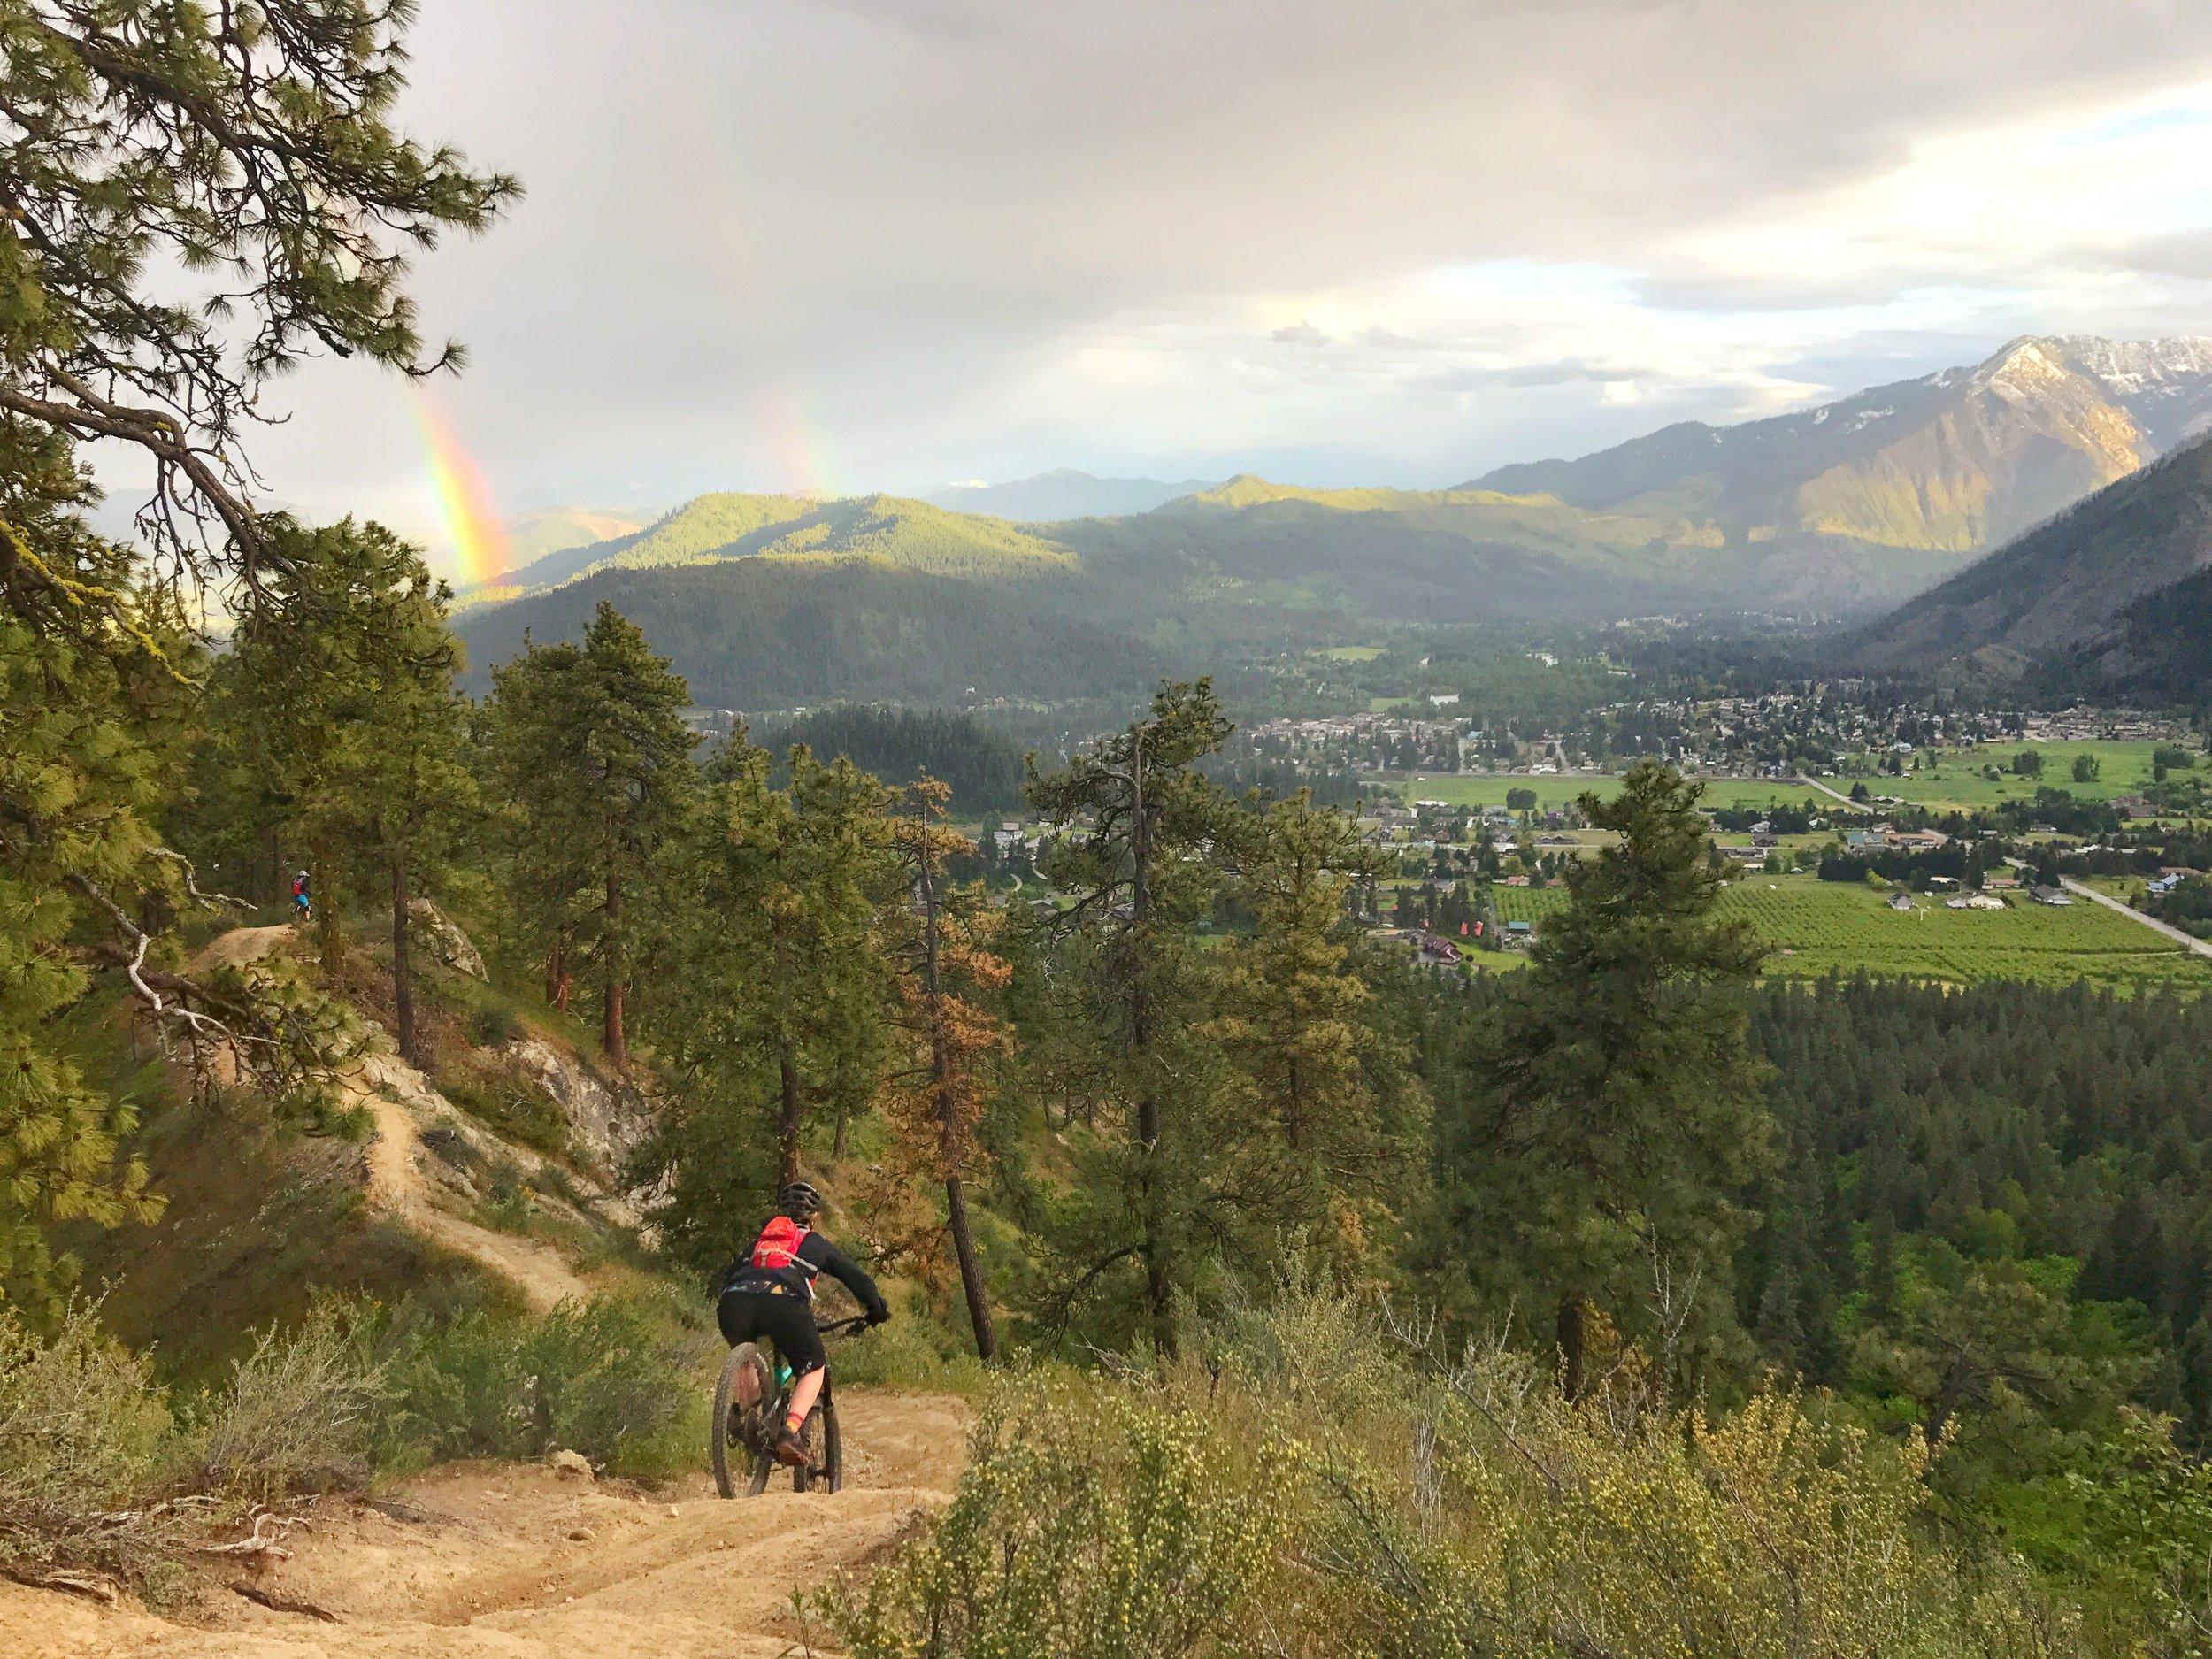 Leavenworth—Bavarian village, mountain biking & skiing mecca, cabbage salsa hotspot